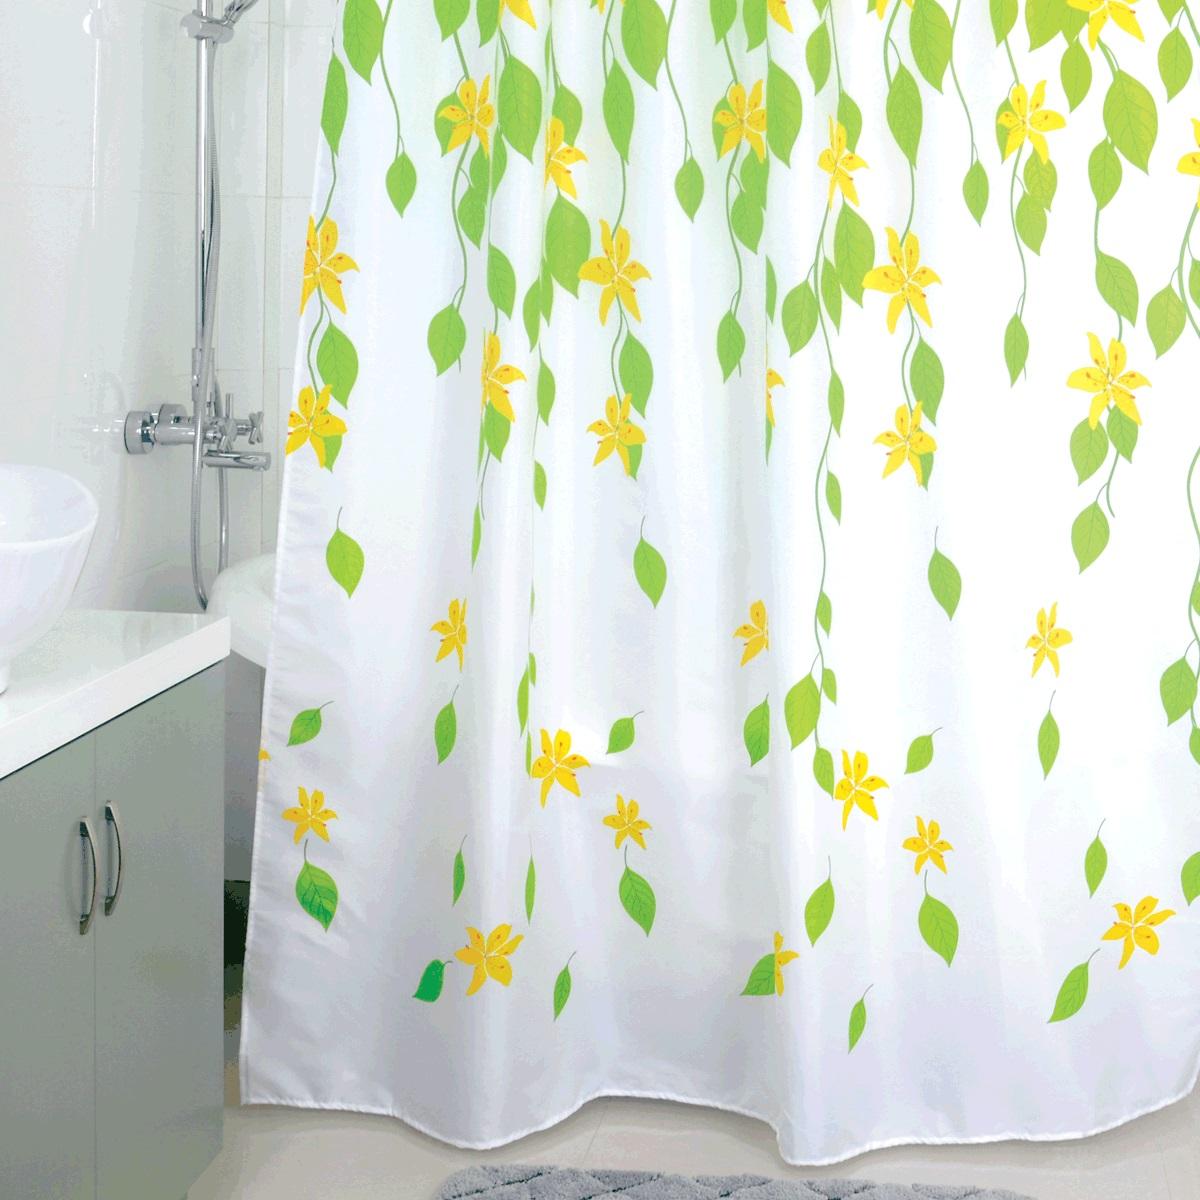 Штора для ванной Milardo Ivy Space, цвет: белый, зеленый, желтый, 180 x 200 см mears patricia breward christopher boyer g bruce chensvold christian monden masafumi mcneil pe ivy style